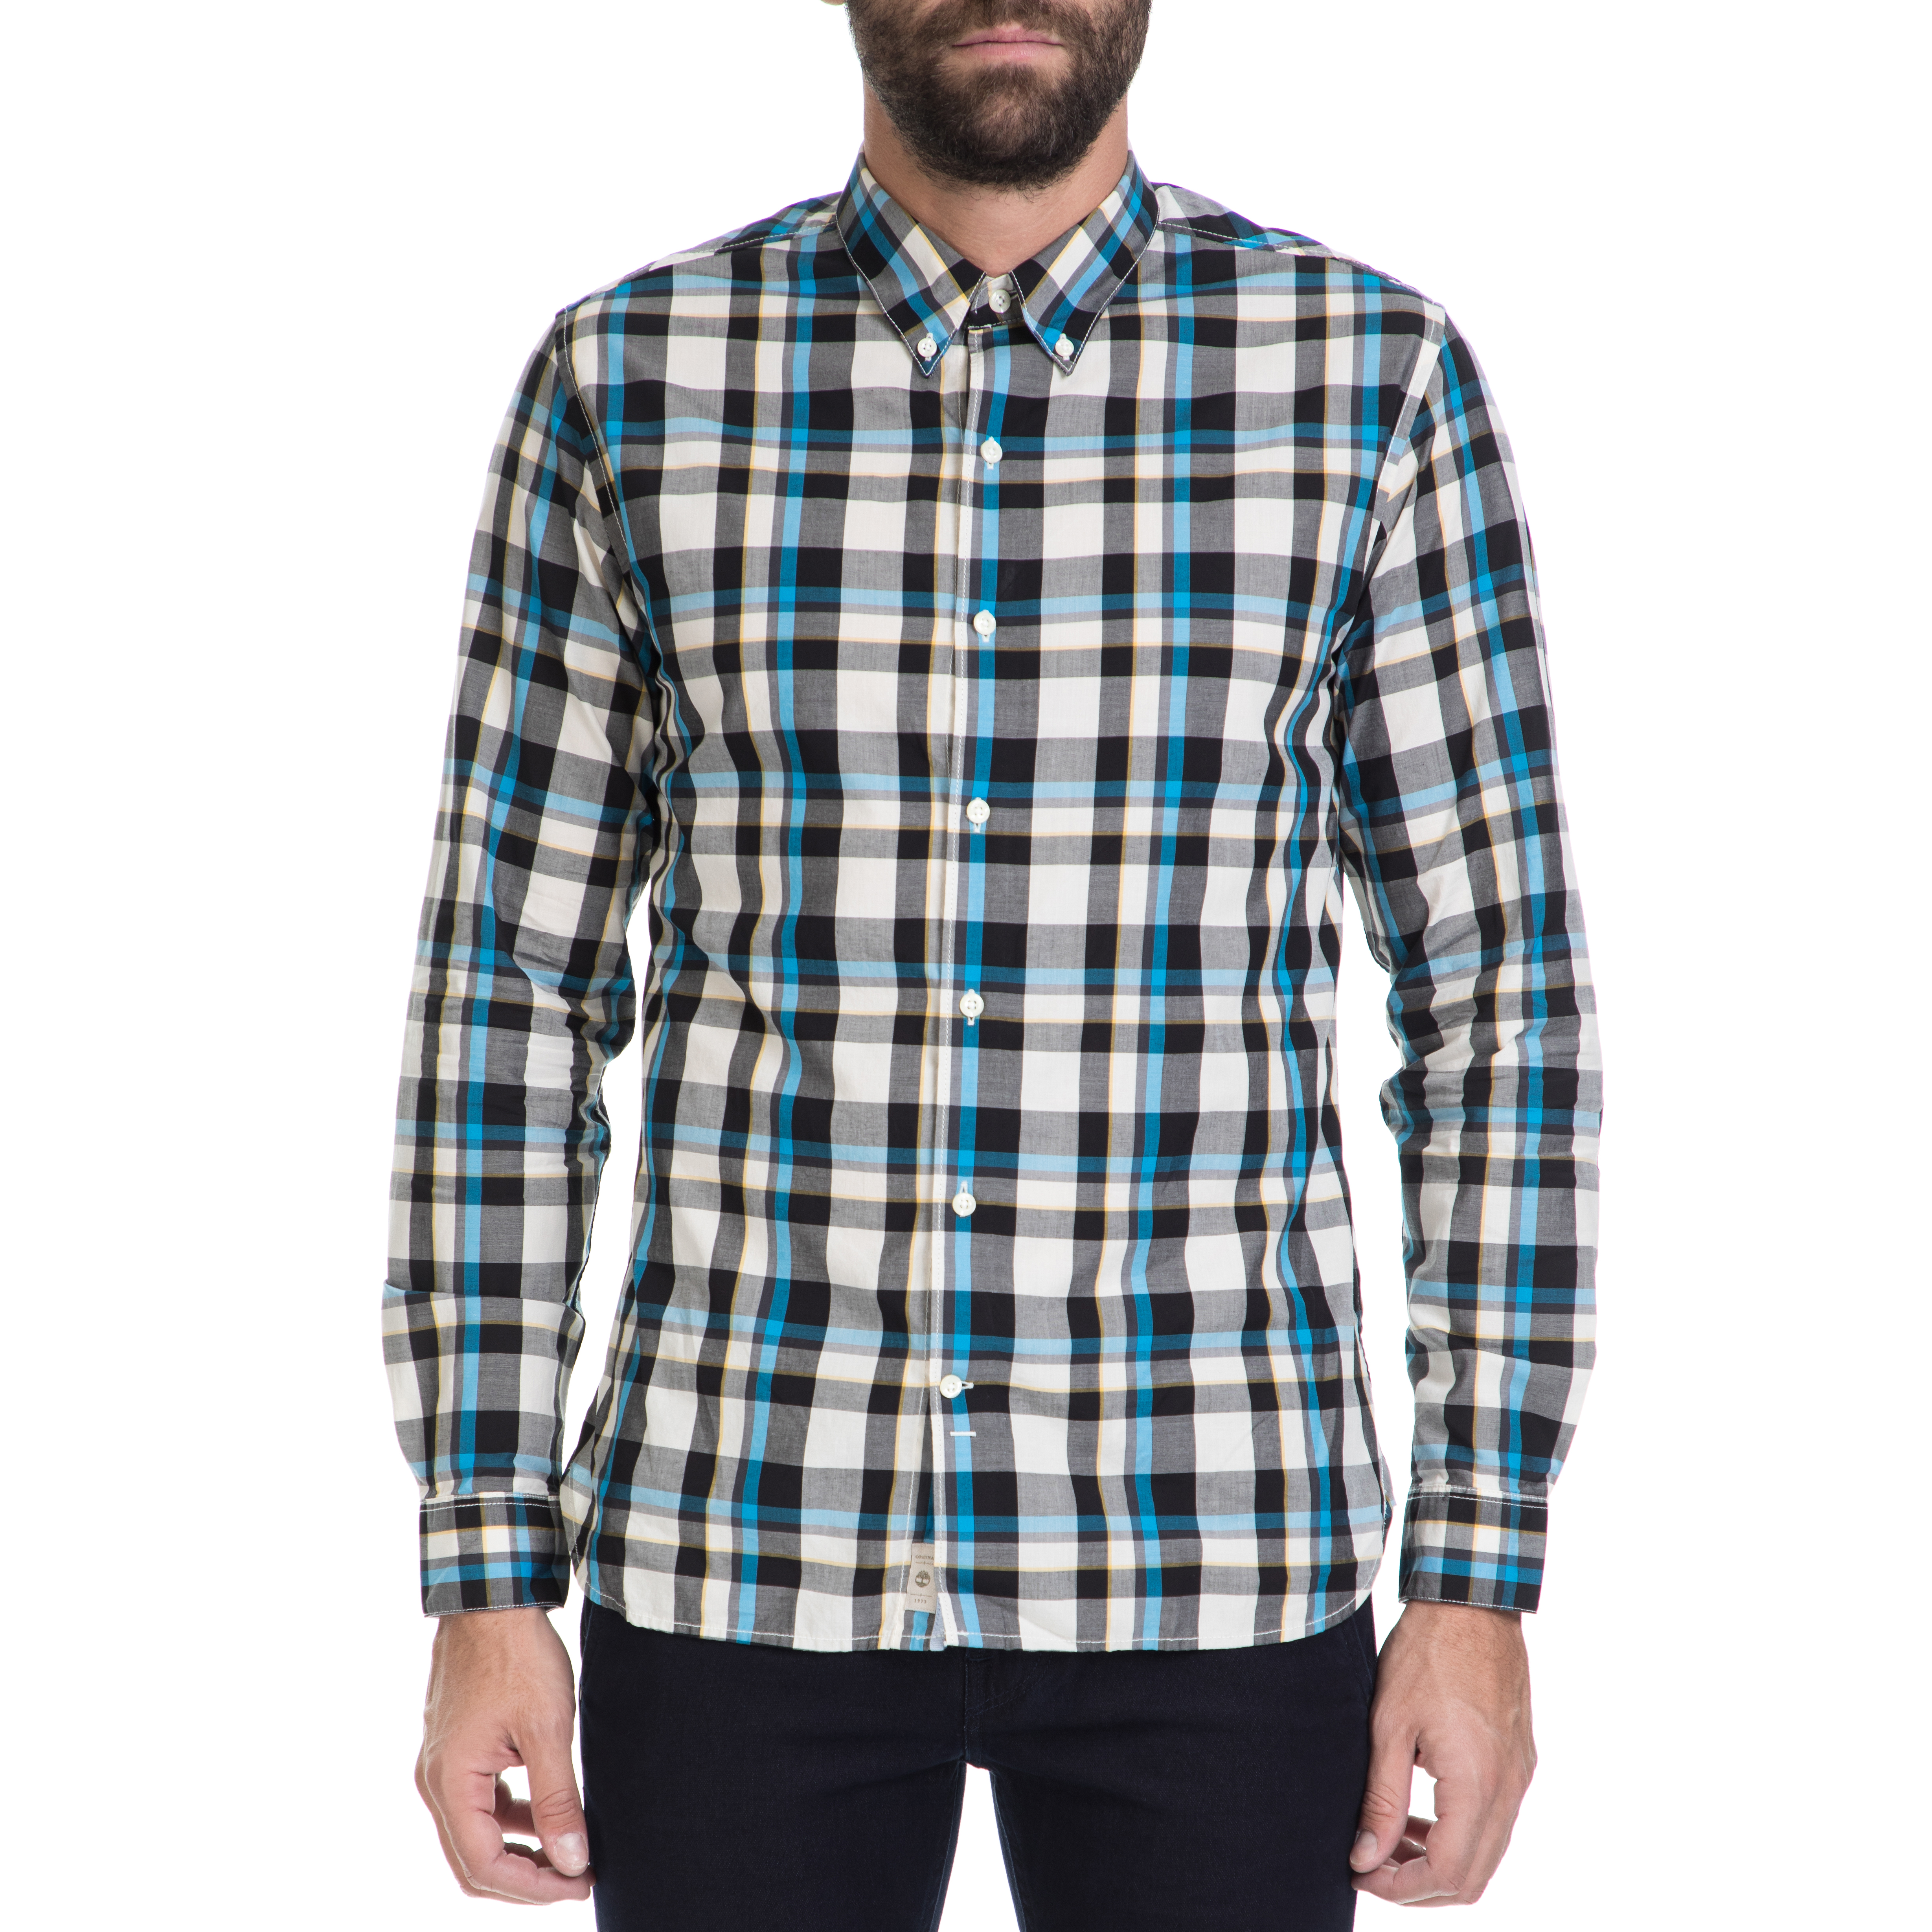 TIMBERLAND - Ανδρικό πουκάμισο TIMBERLAND λευκό-μαύρο-μπλε ανδρικά ρούχα πουκάμισα μακρυμάνικα